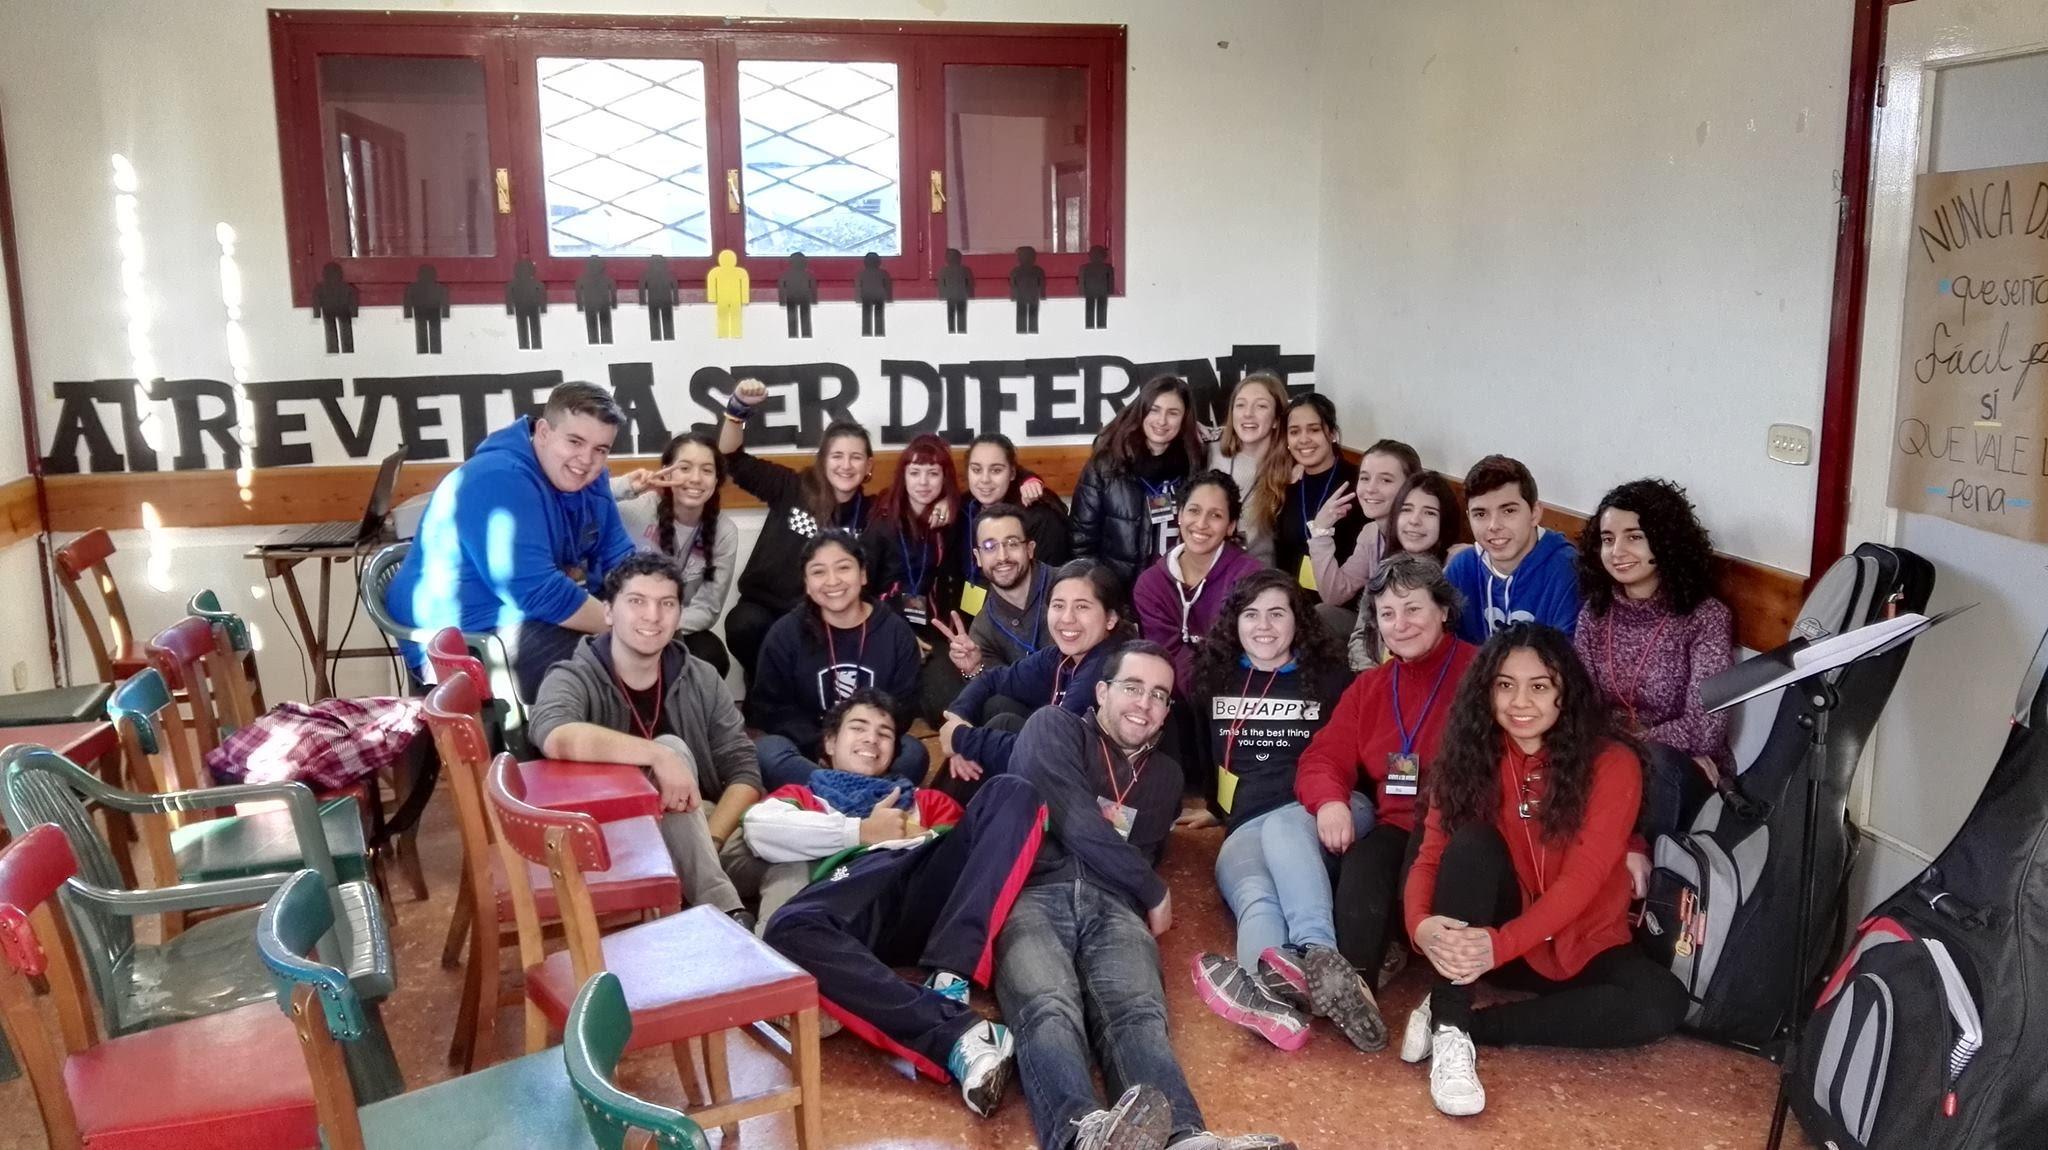 2017.02.17y18 - Desafió ATREVETE A SER DIFERENTE (7).jpg